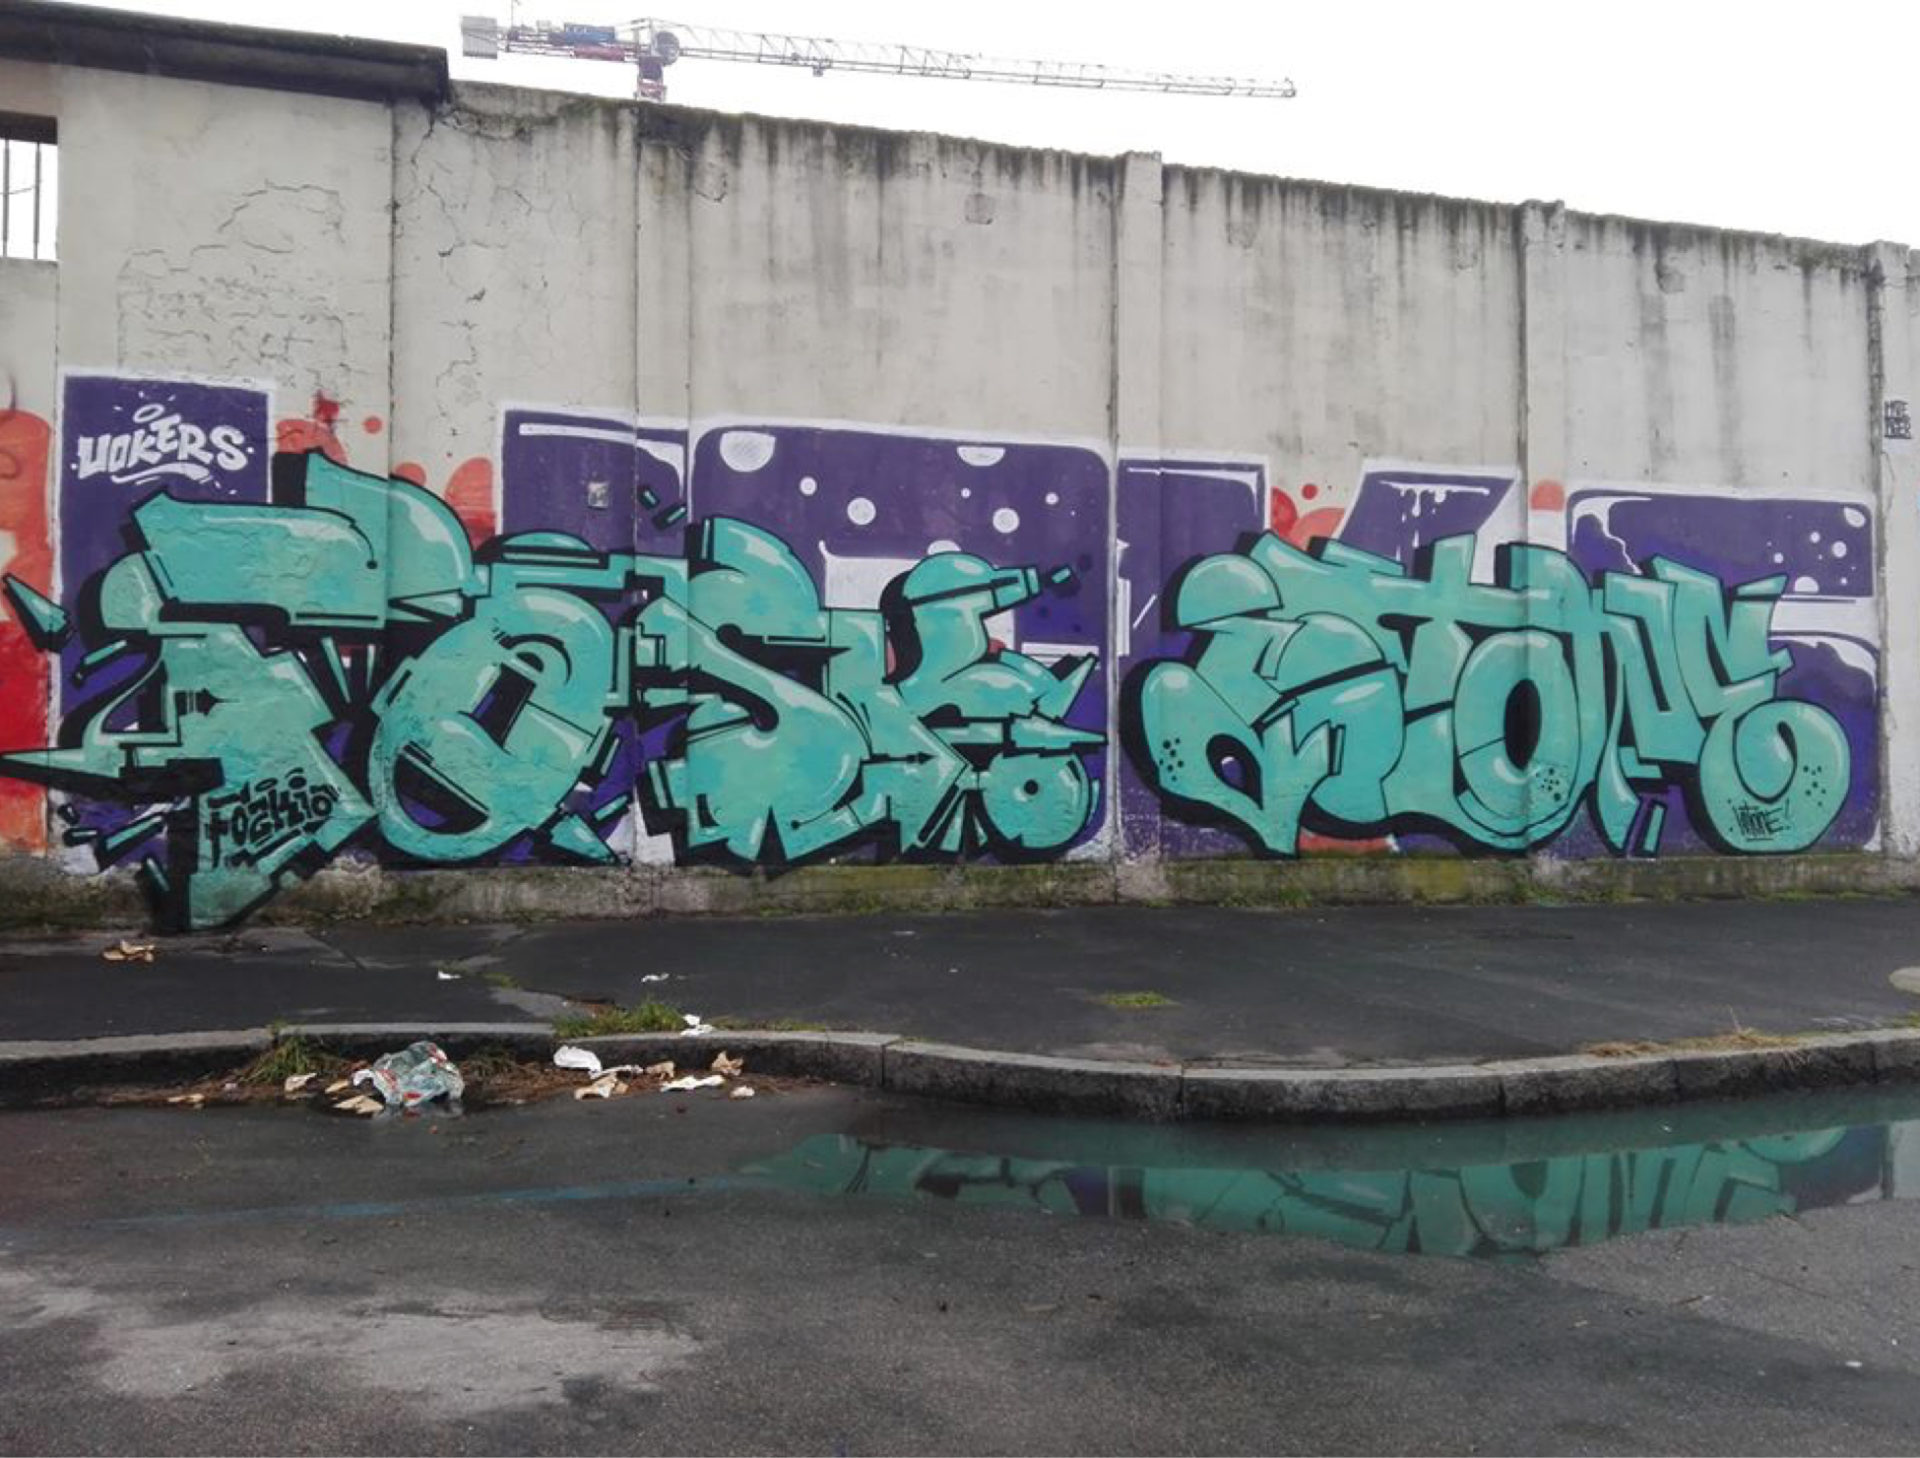 Fosk + Iotone